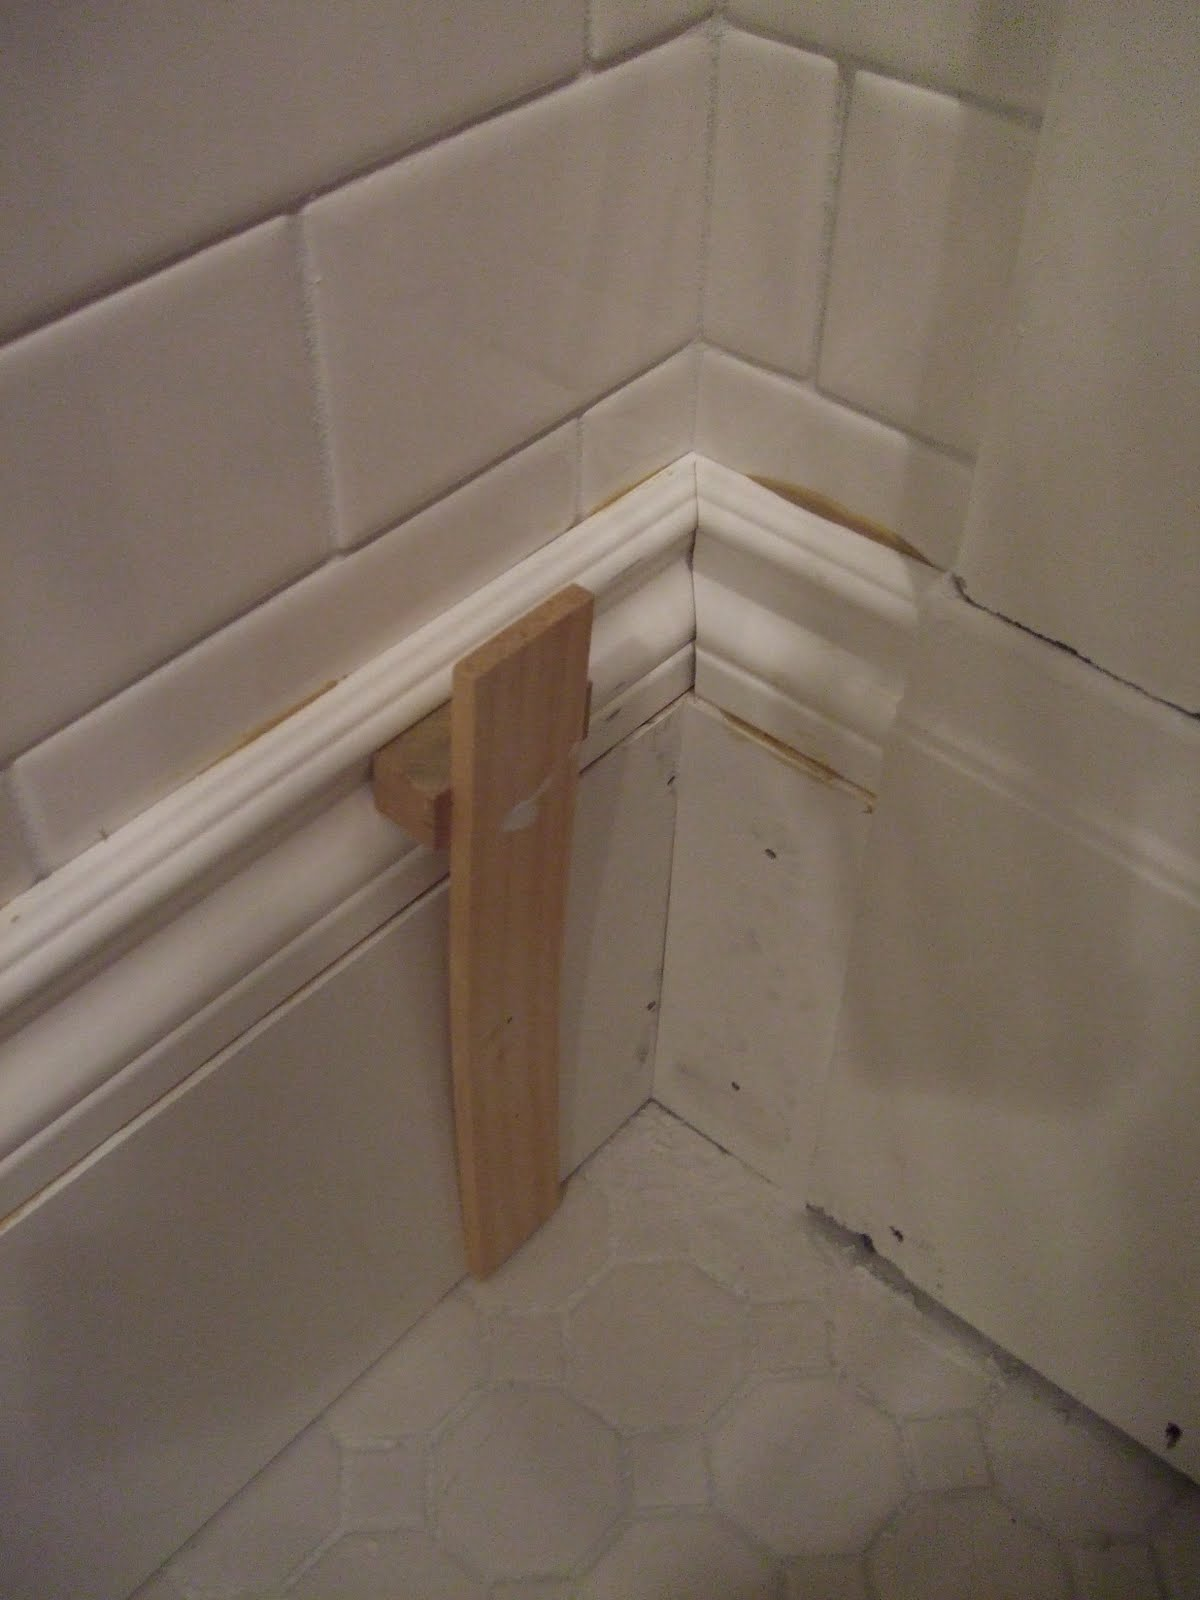 The Smiths: Bathroom Baseboard